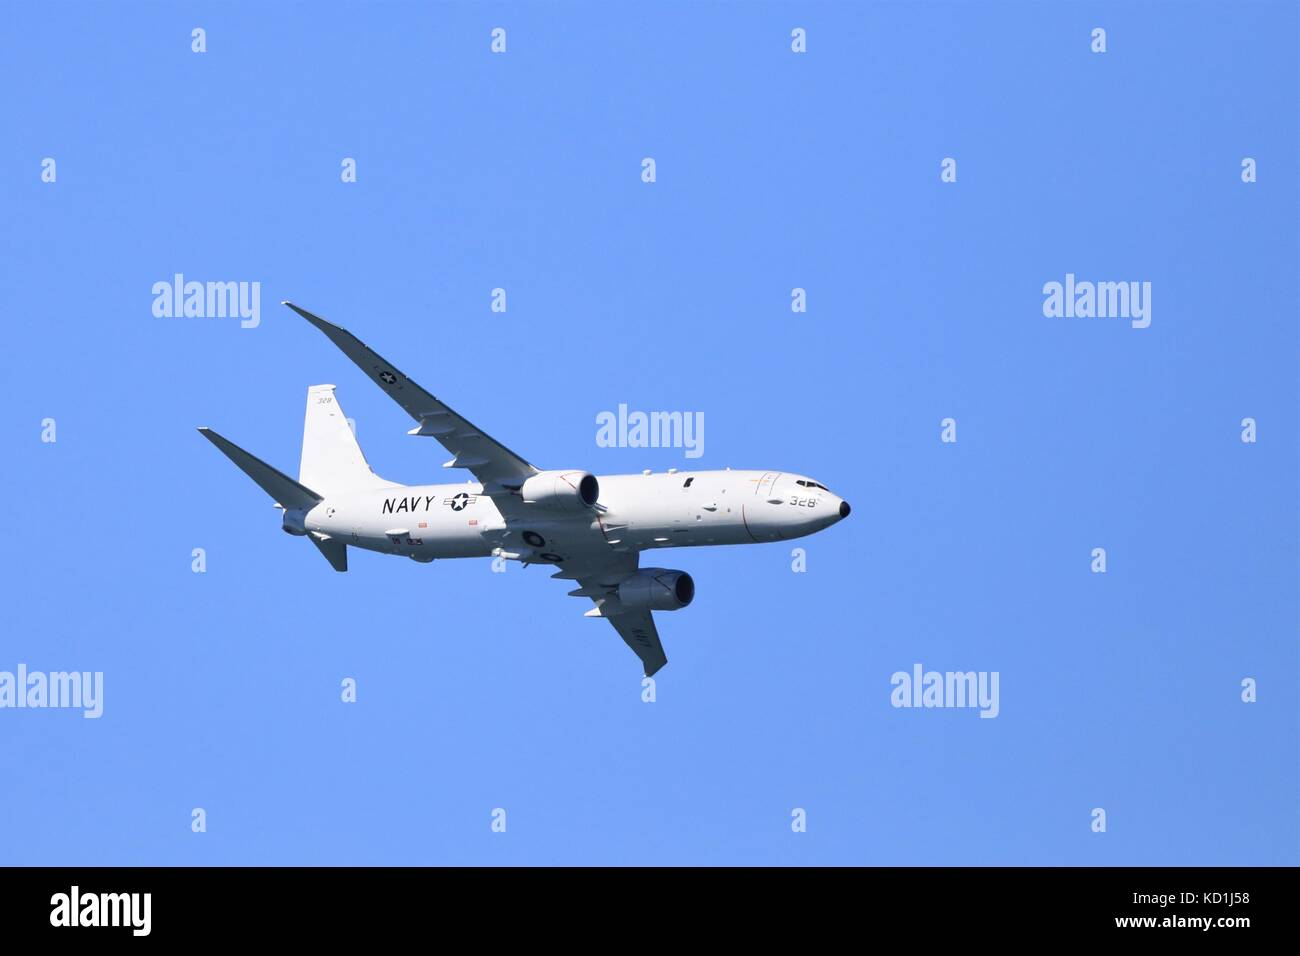 Boeing P-8 Poseidon Navy Aircraft Flies in San Francisco Fleet Week Airshow - Stock Image